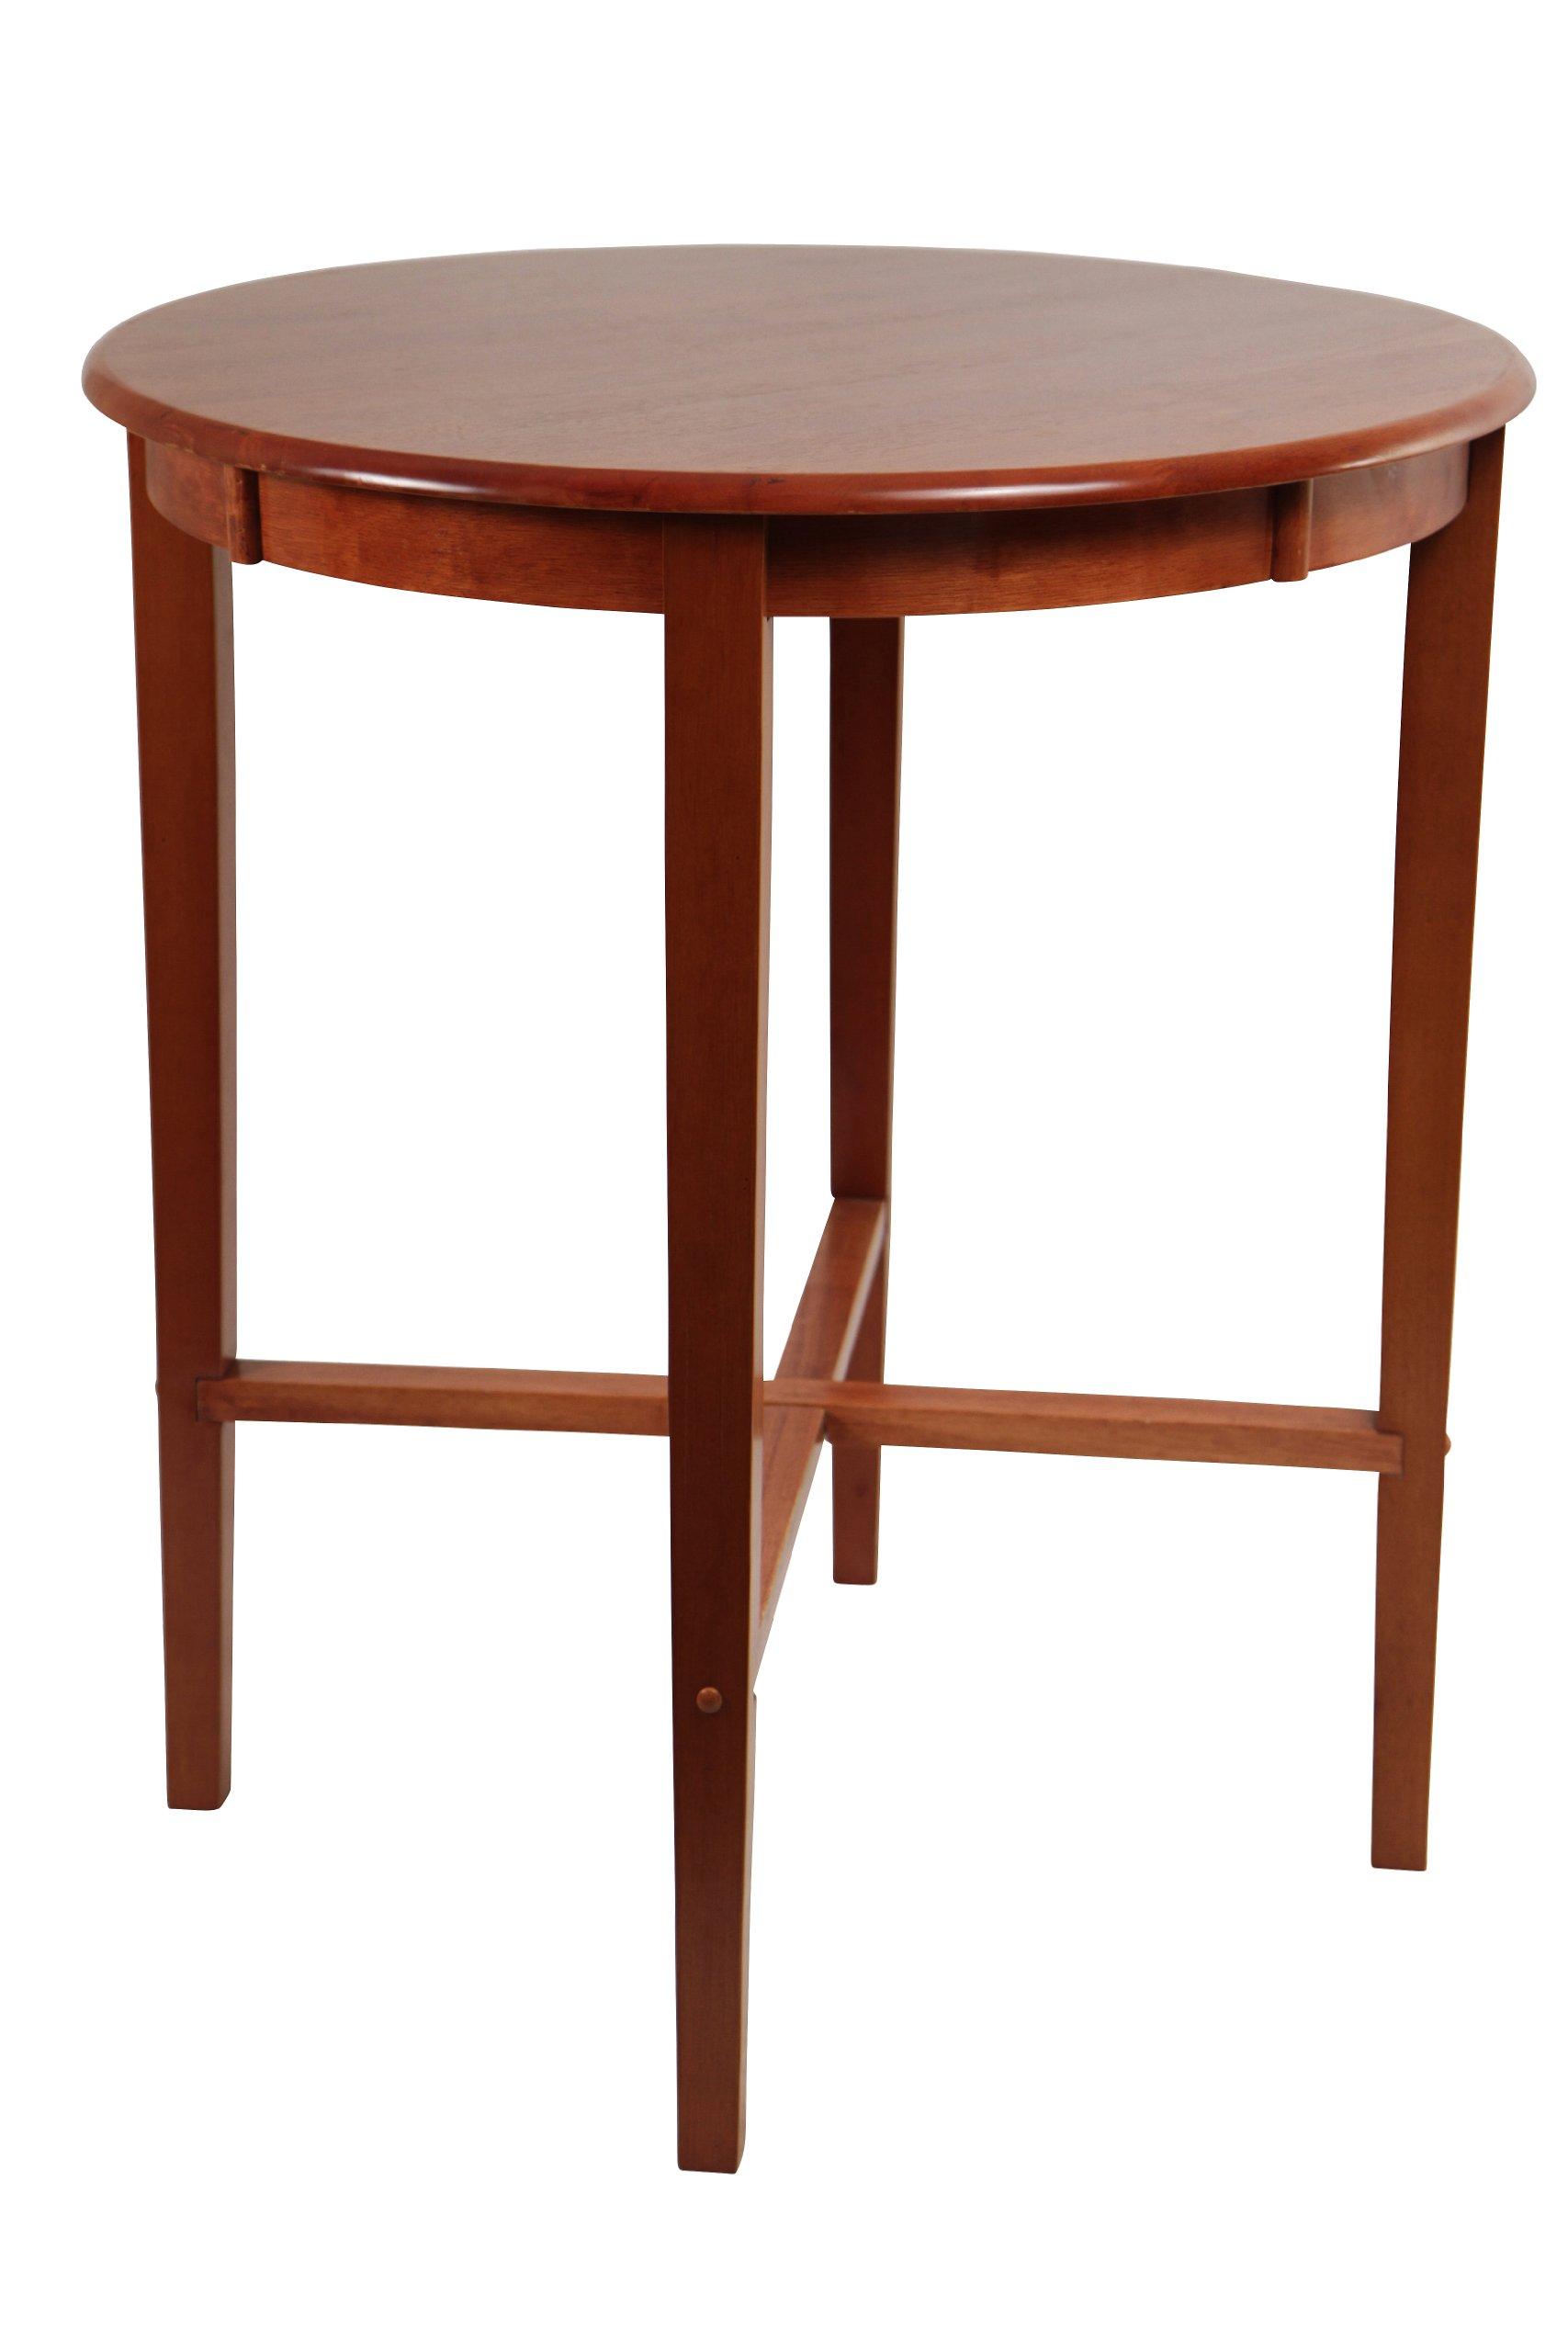 Boraam 70564 Round Pub Table, 42-Inch, Cherry